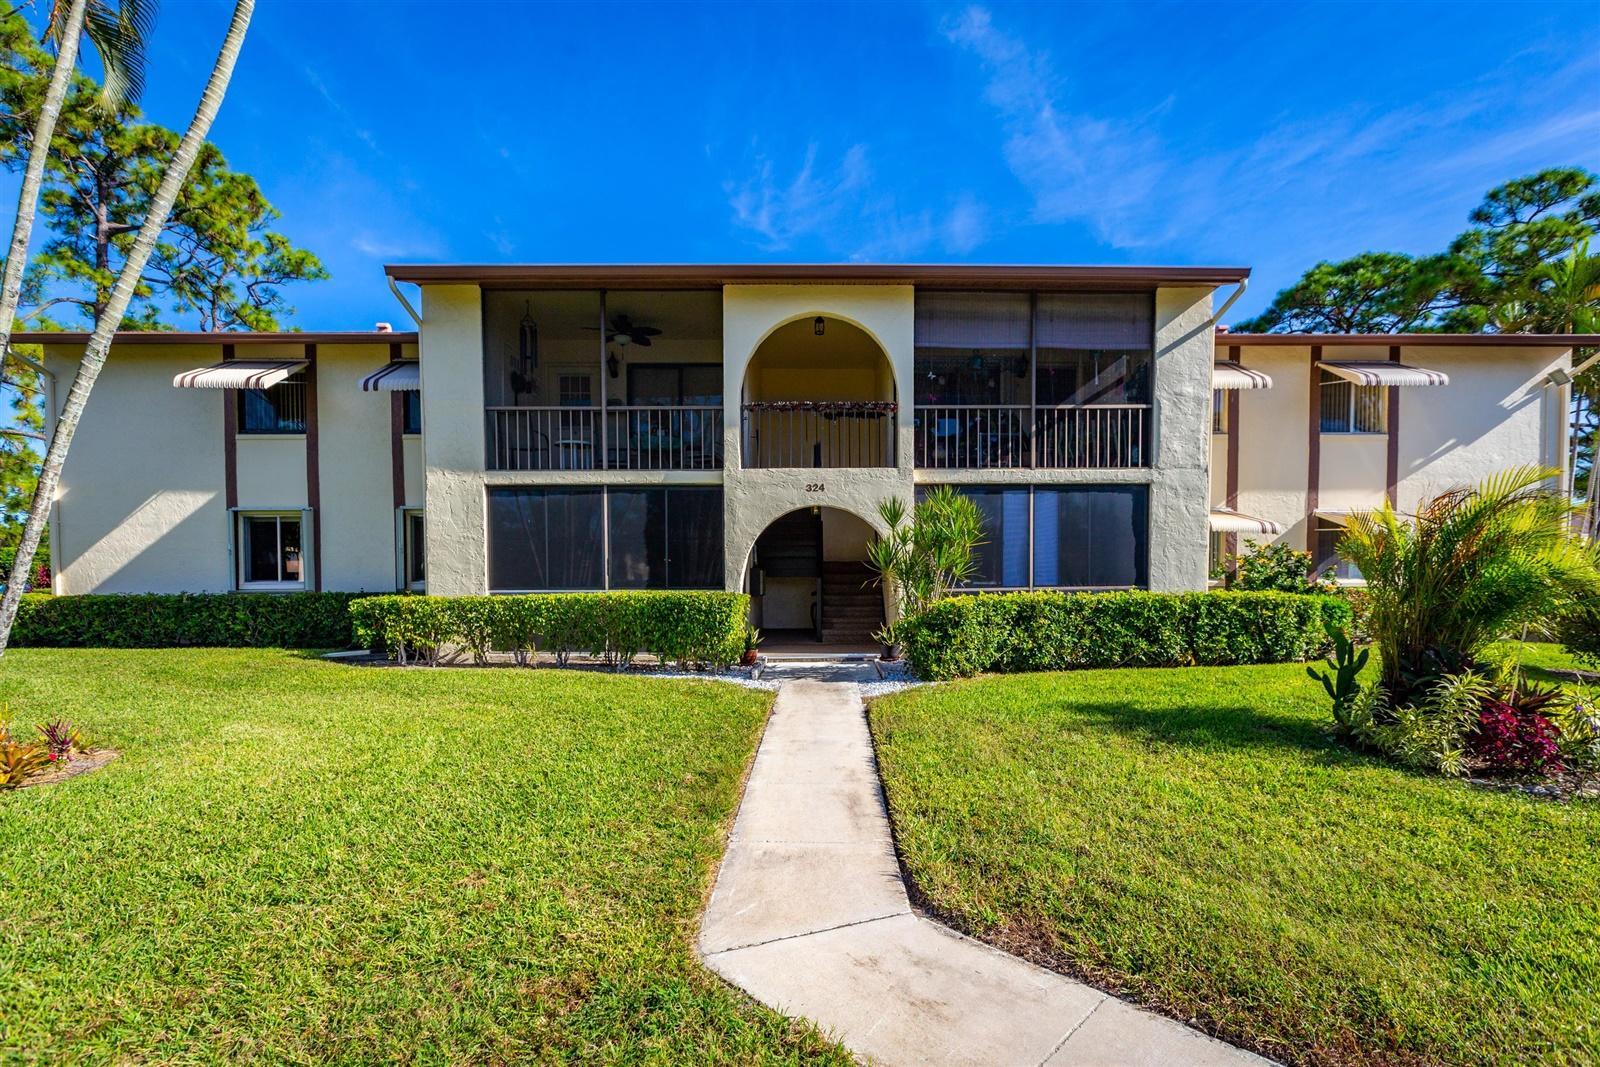 324 Knotty Pine Unit A-1, Greenacres, Florida 33463